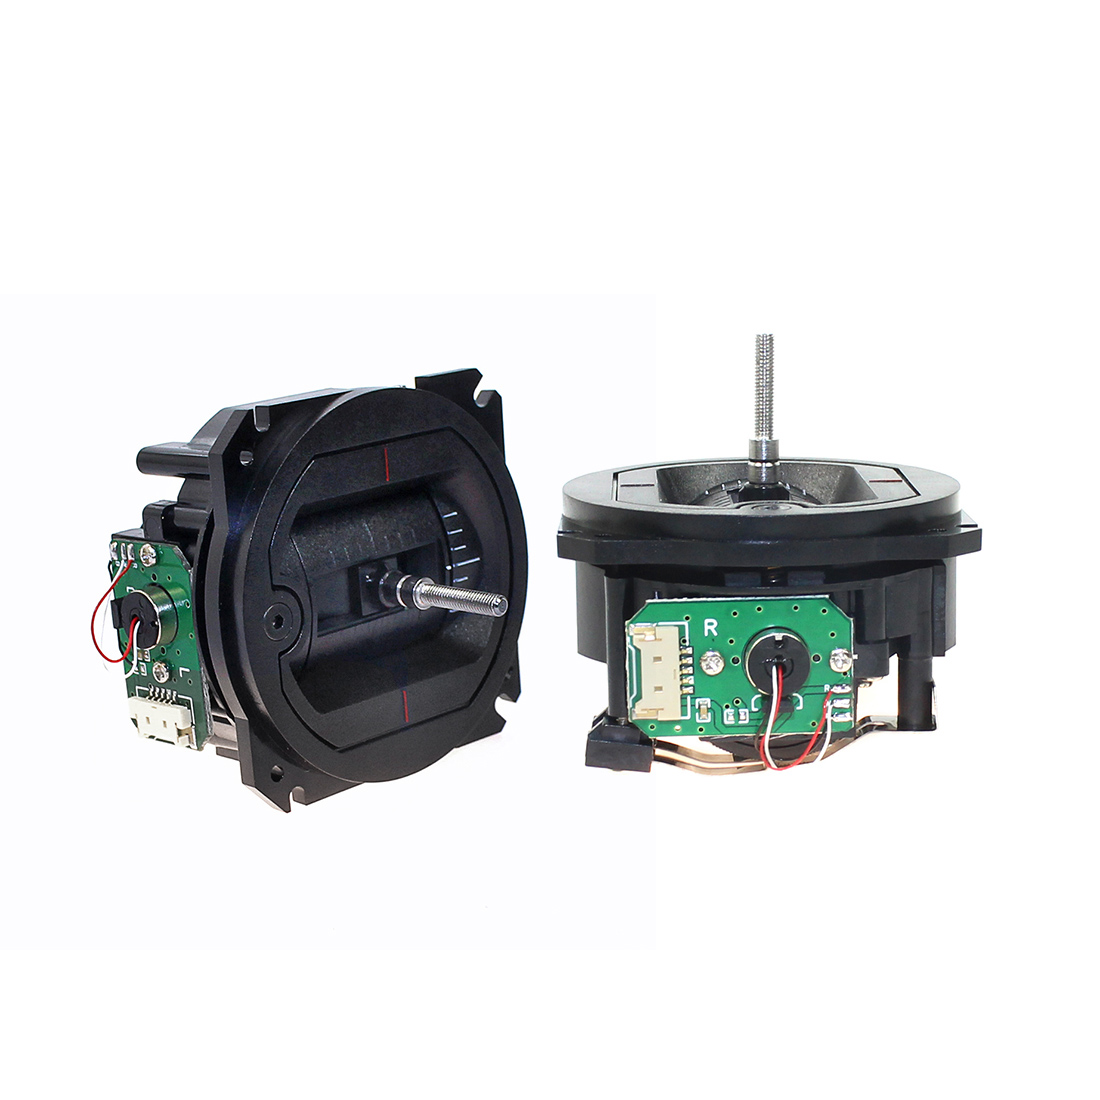 2Pcs Jumper Halle Sensor Gimbal für Jumper T16 pro Plus Radios Transmitter Upgrade T16 Serie Sensor Gimbal Reparatur Kit